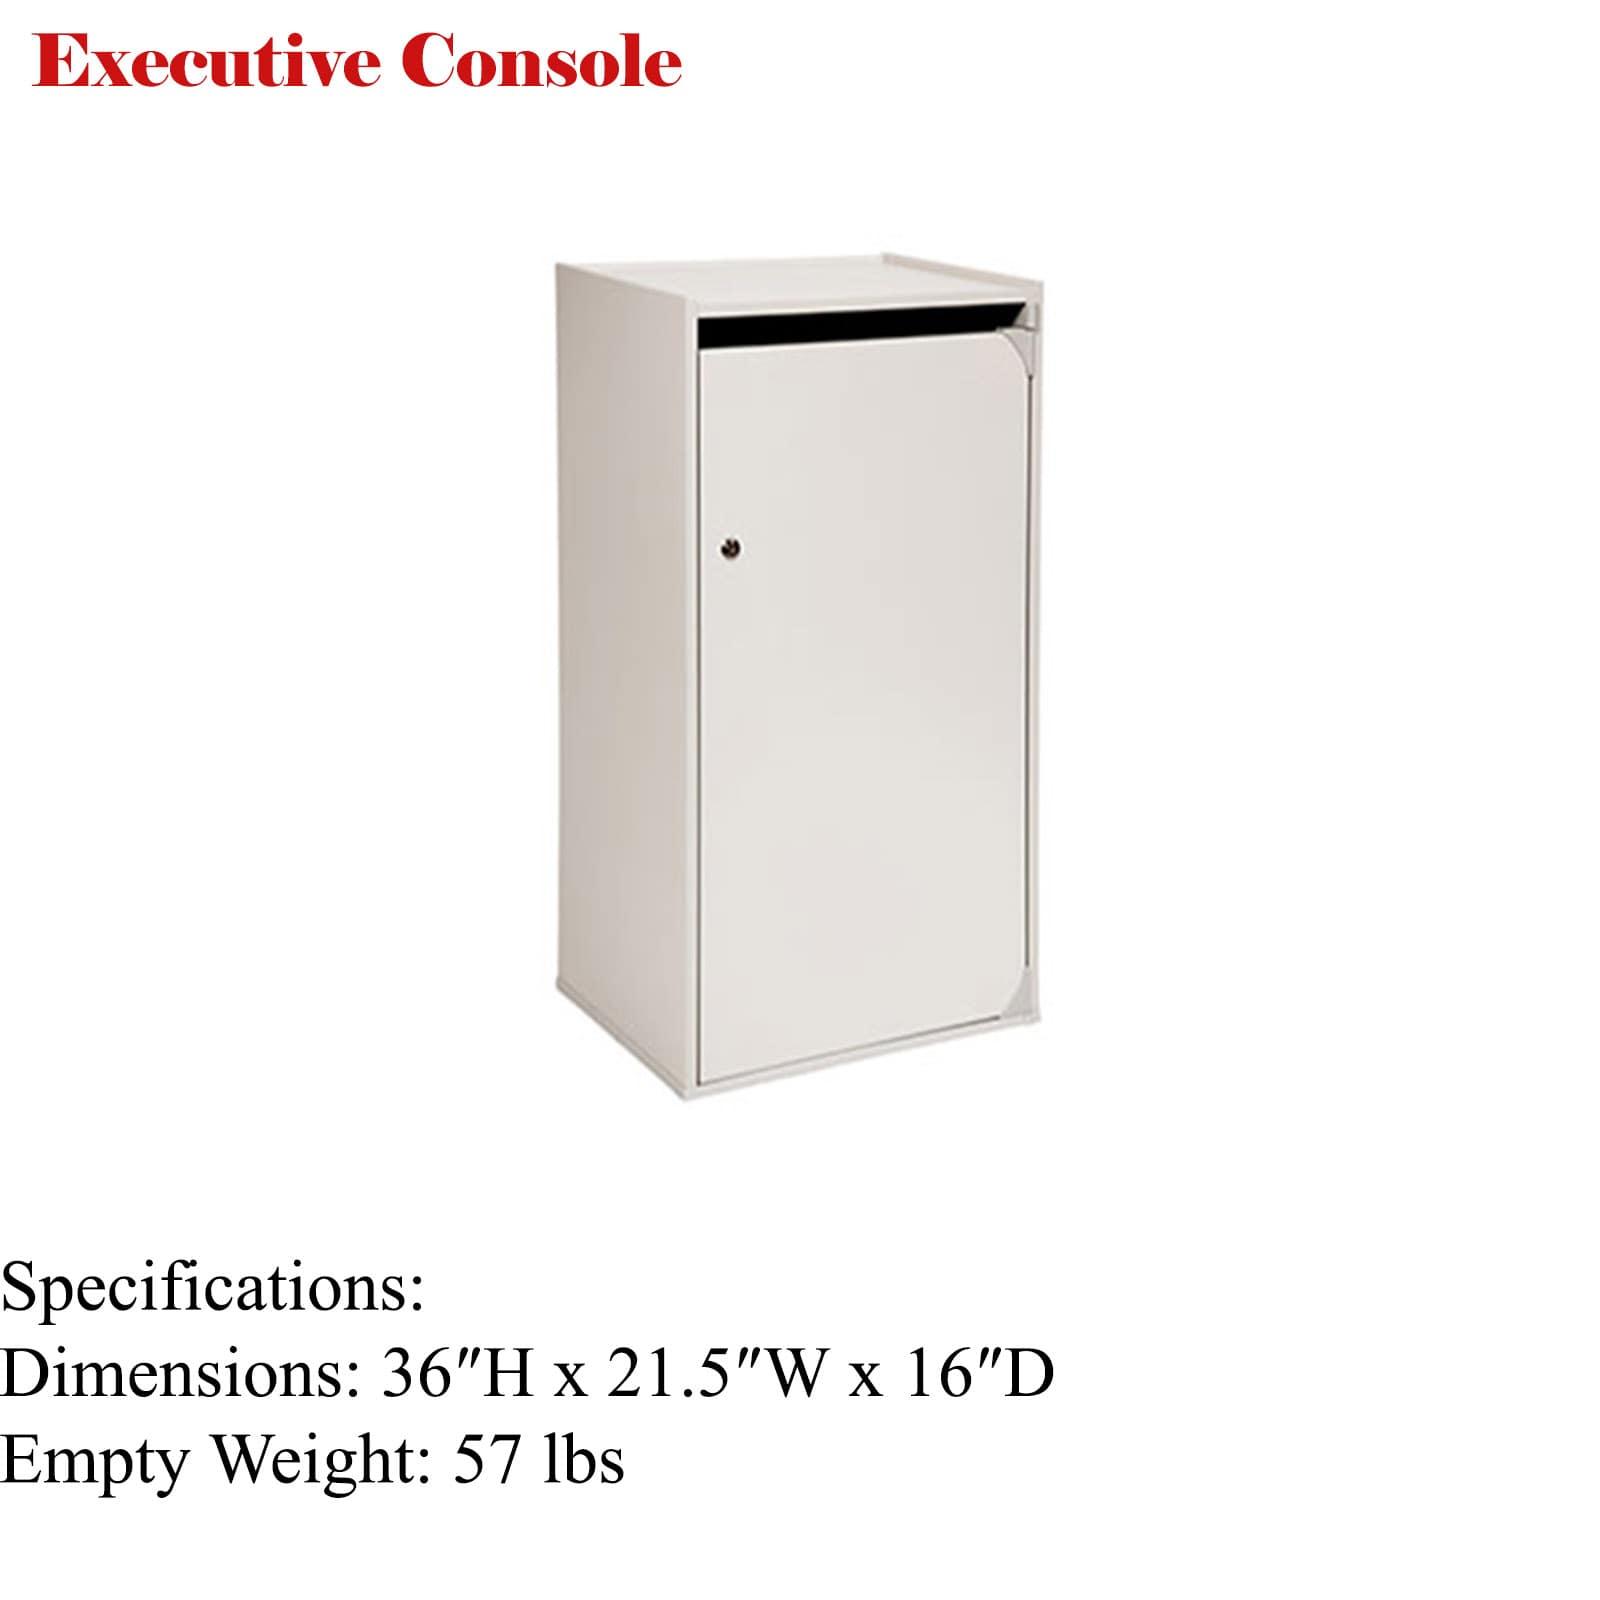 Executive Console